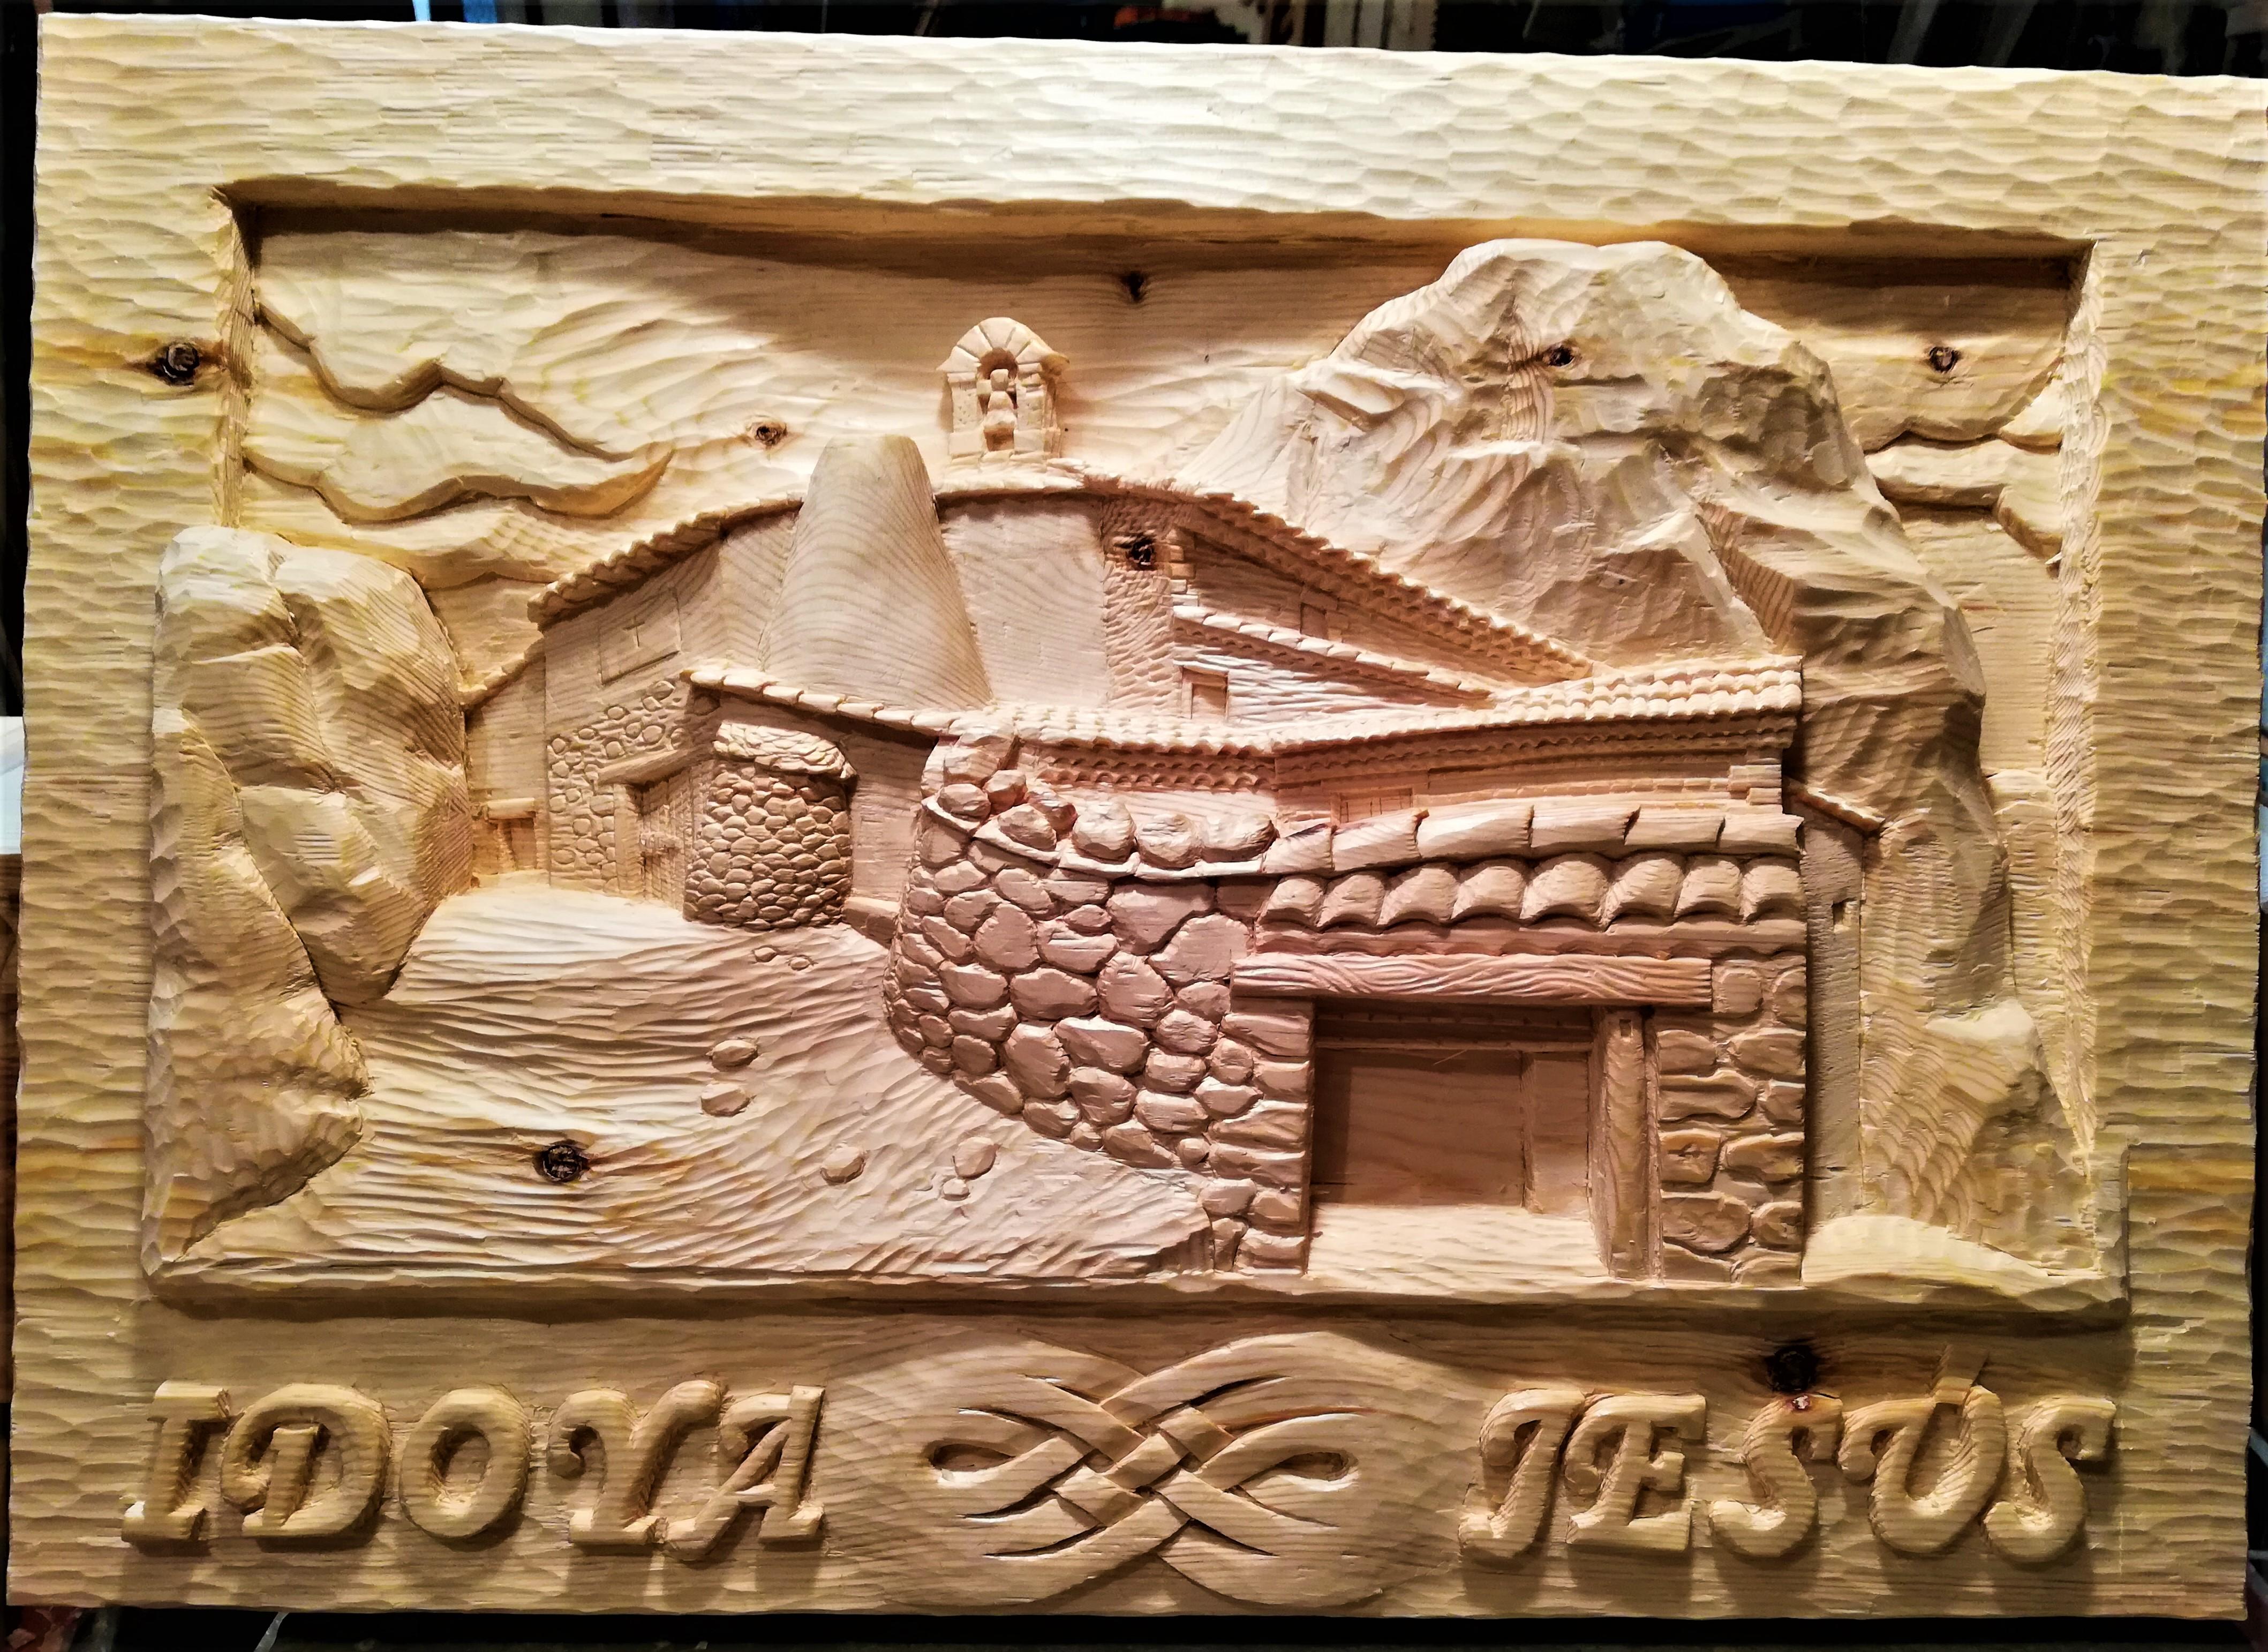 Cuadro Idoya Jesús-piedra-artesanía-tall